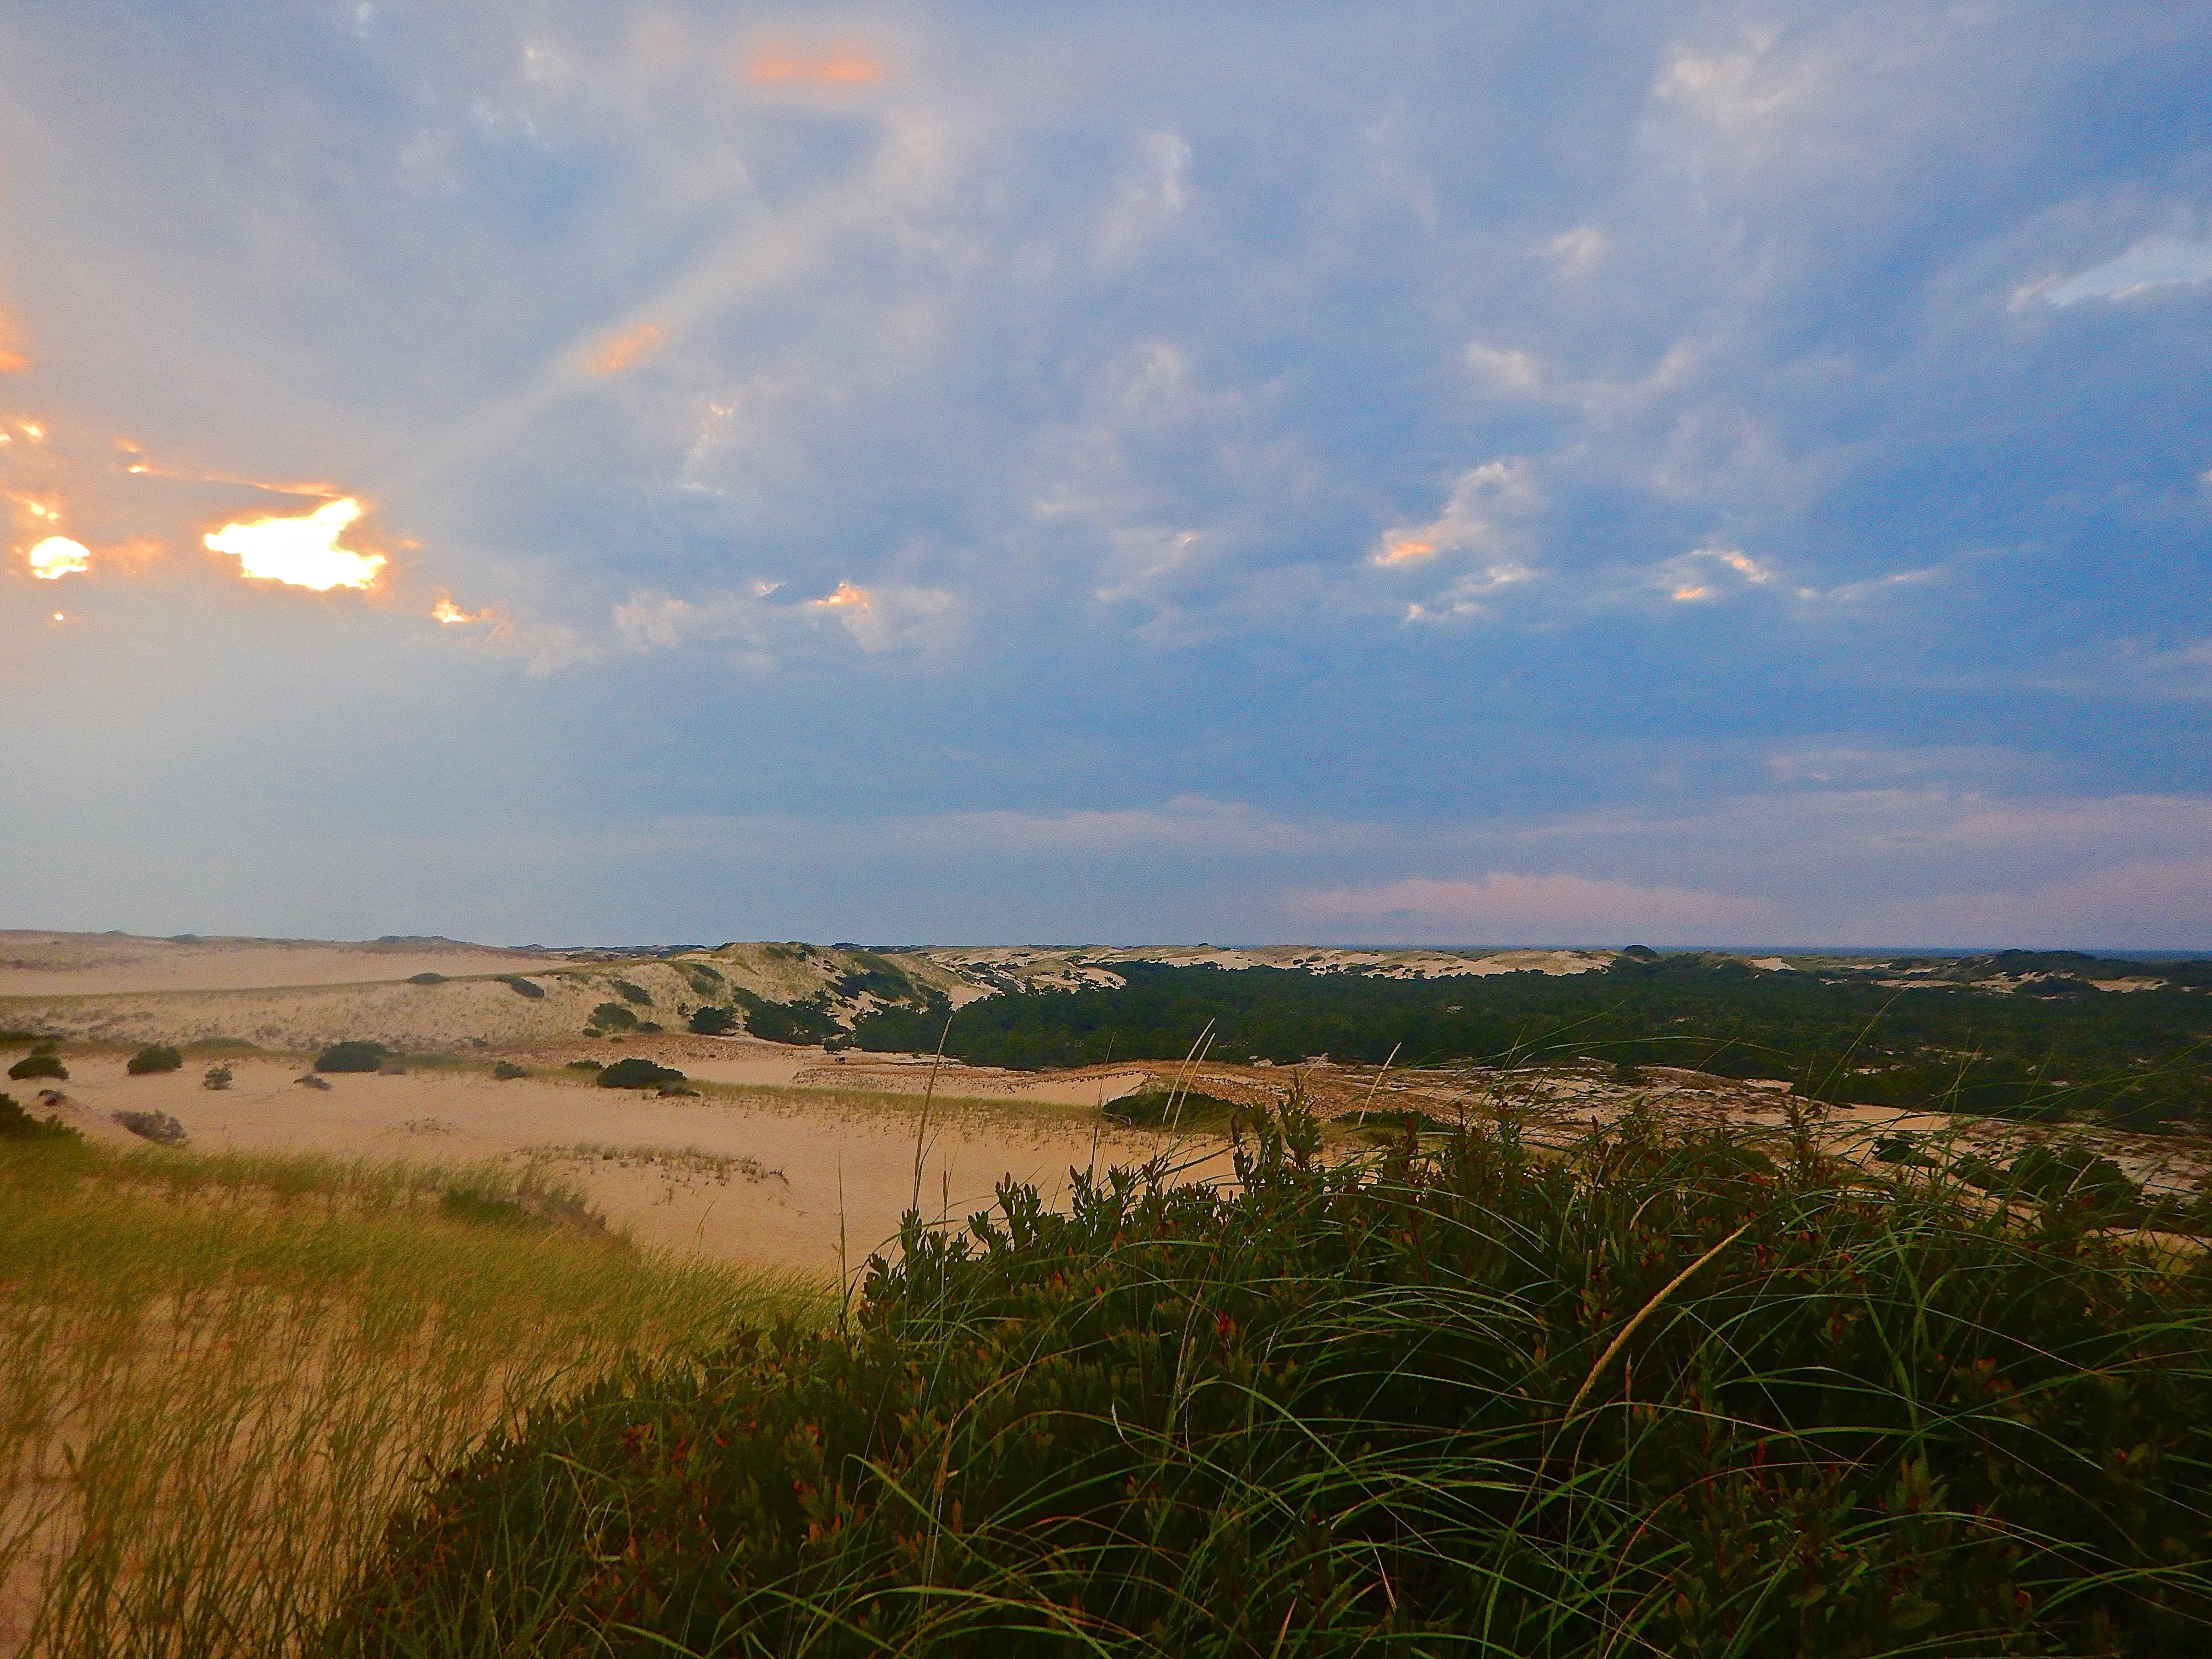 Caption: Sunset Over the Province Lands, Cape Cod, MA, Credit: Brian Aust